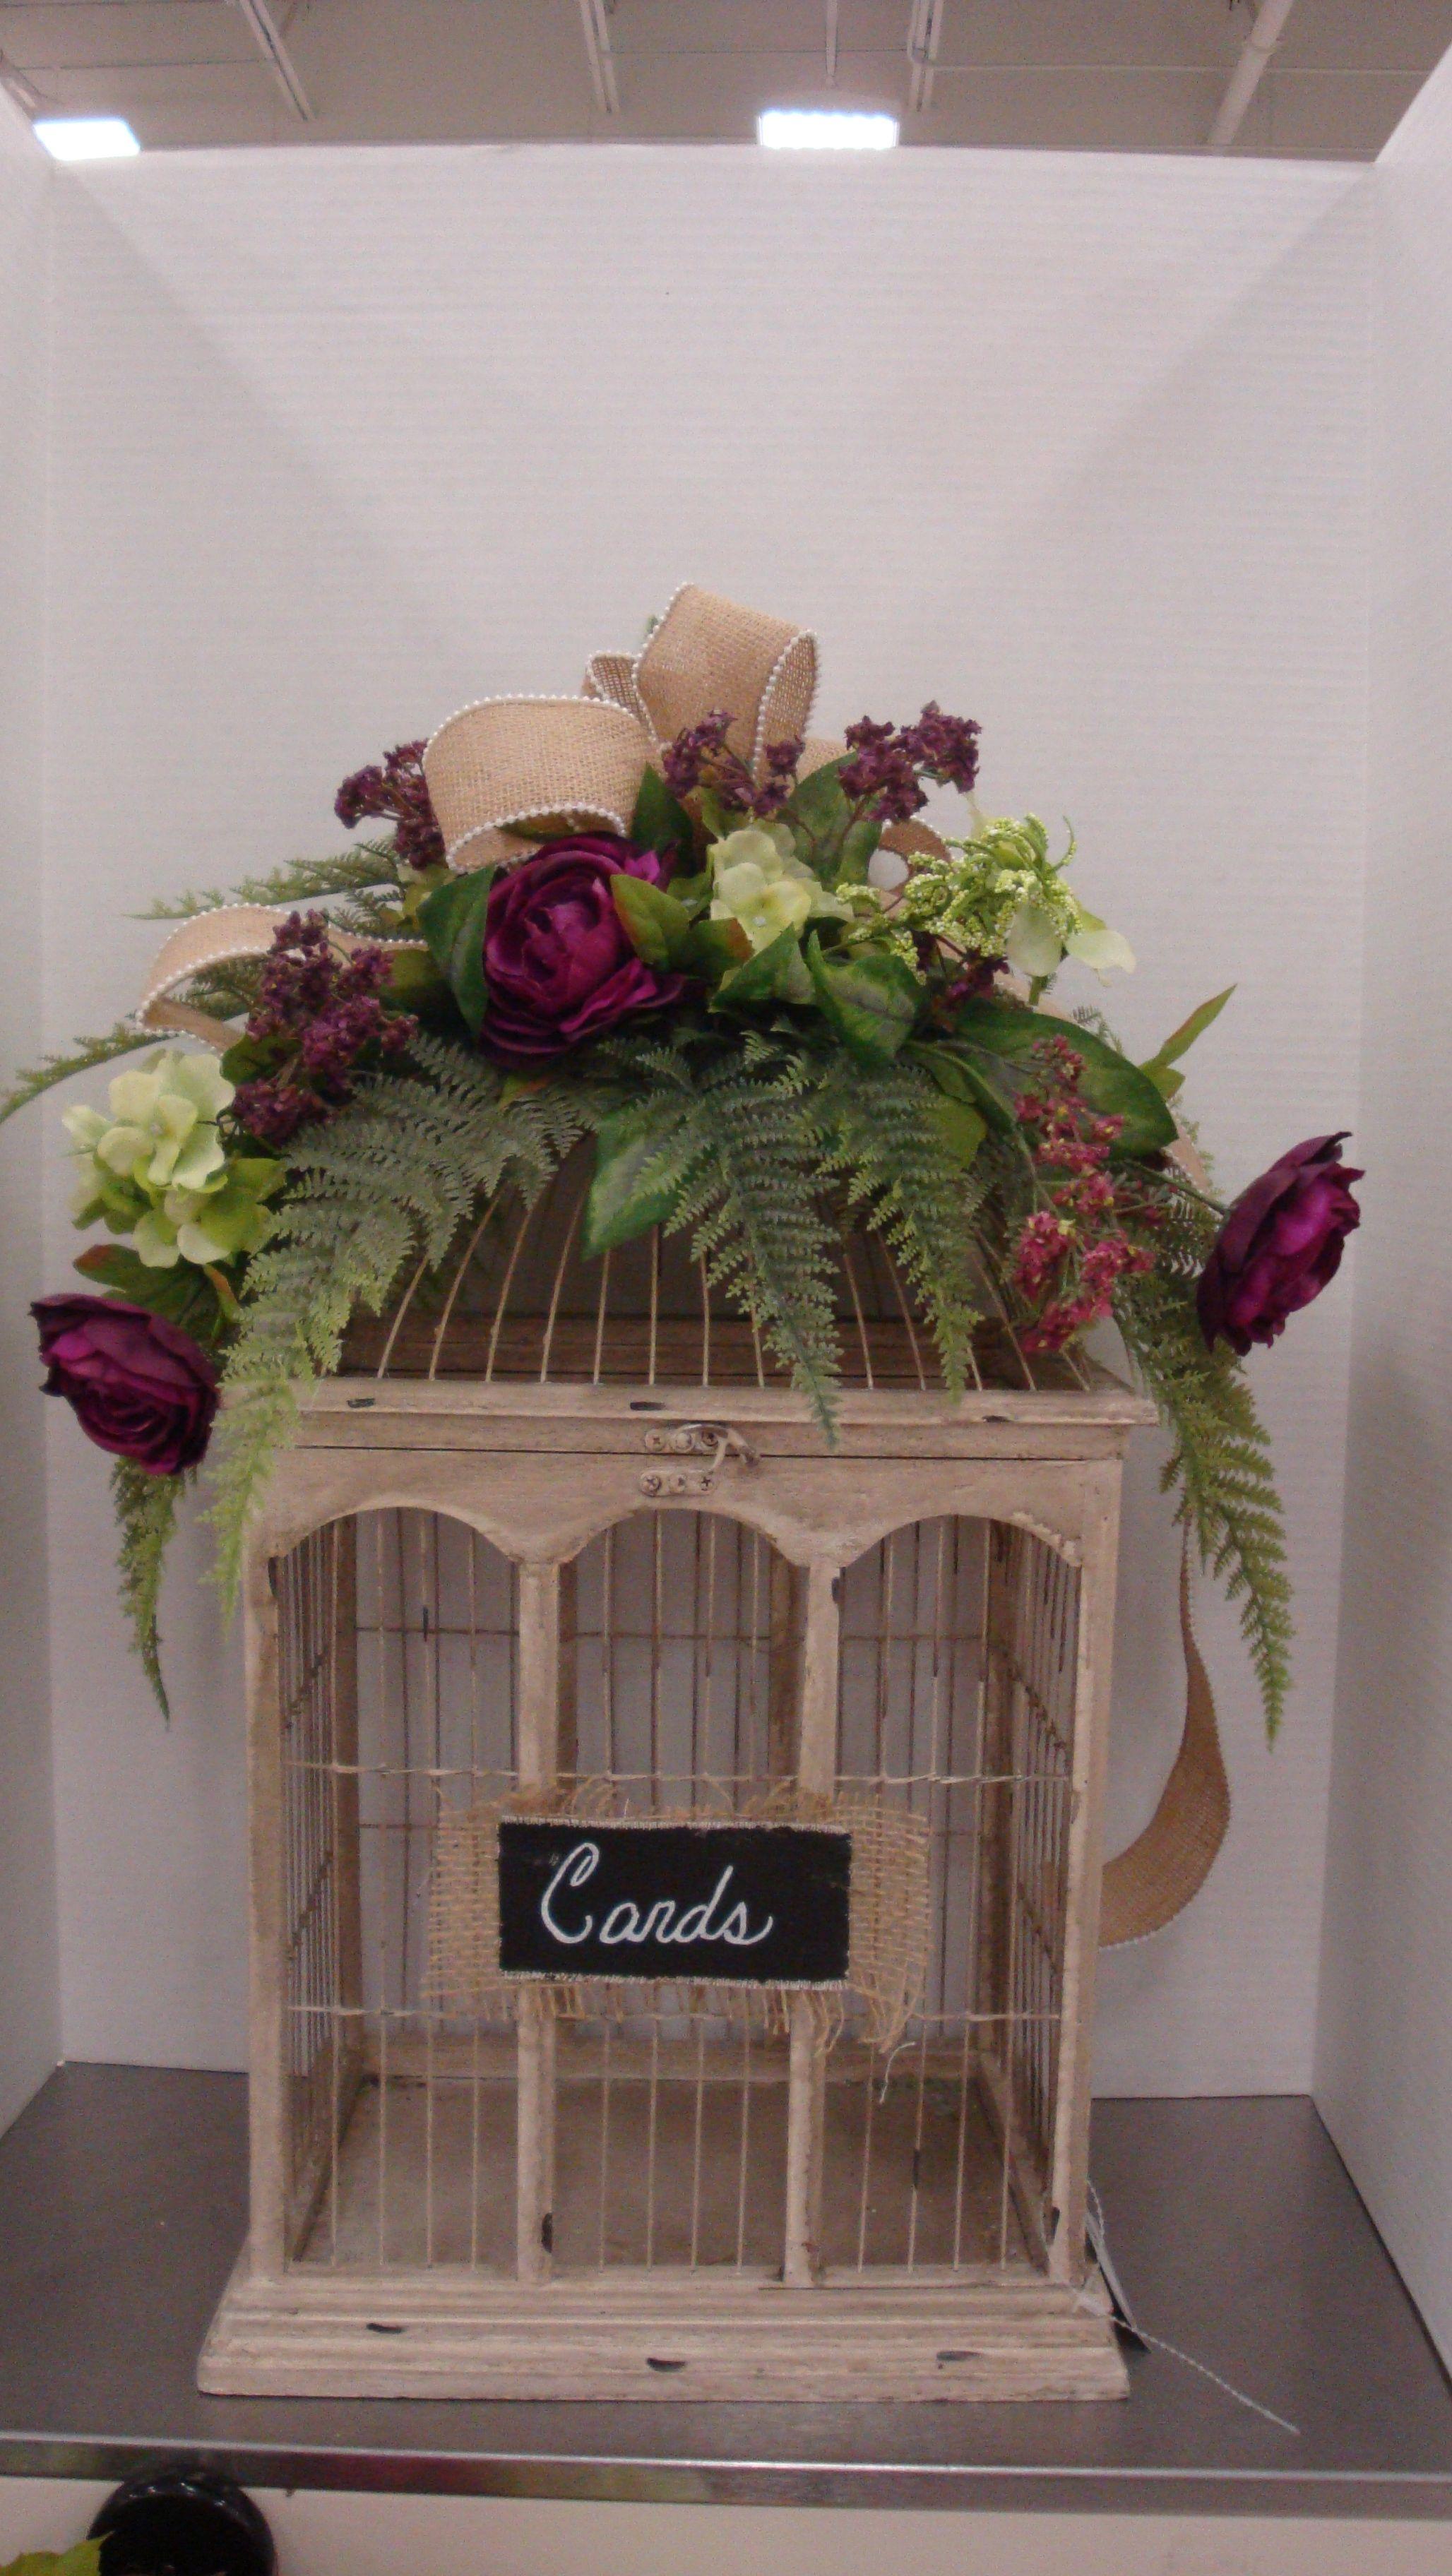 Wedding Birdcage Card Holder an original design by Christine